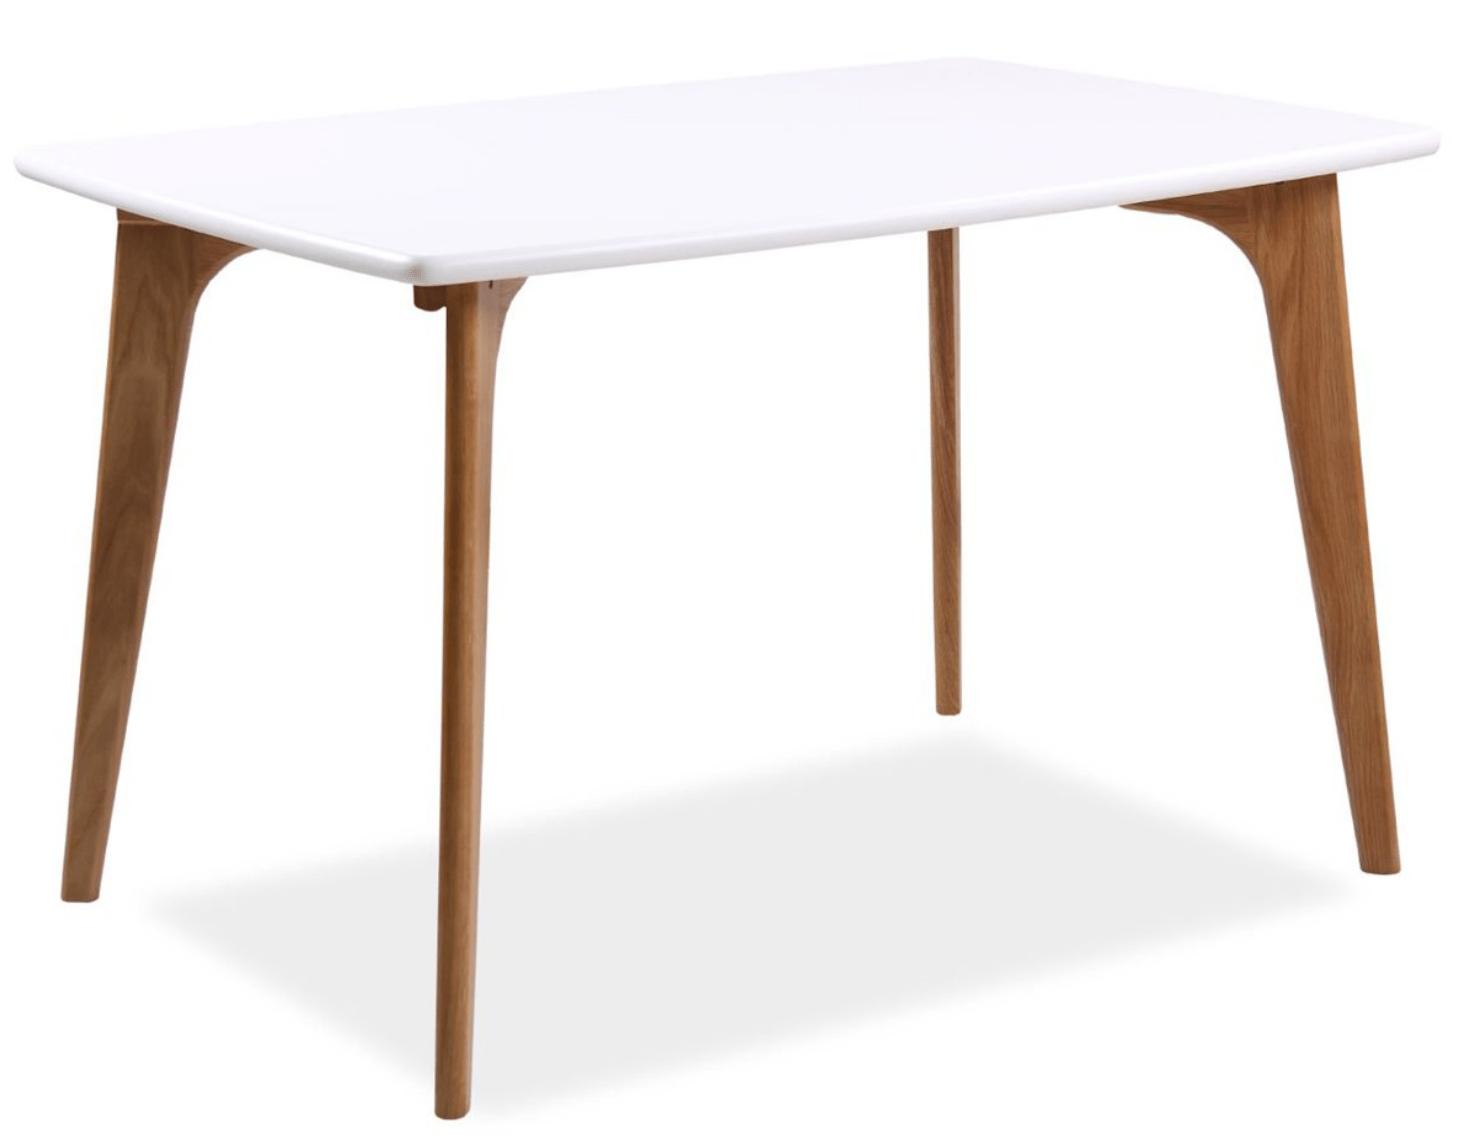 Las 5 mejores mesas de cocina en conforama prodecoracion for Mesa cristal tuco